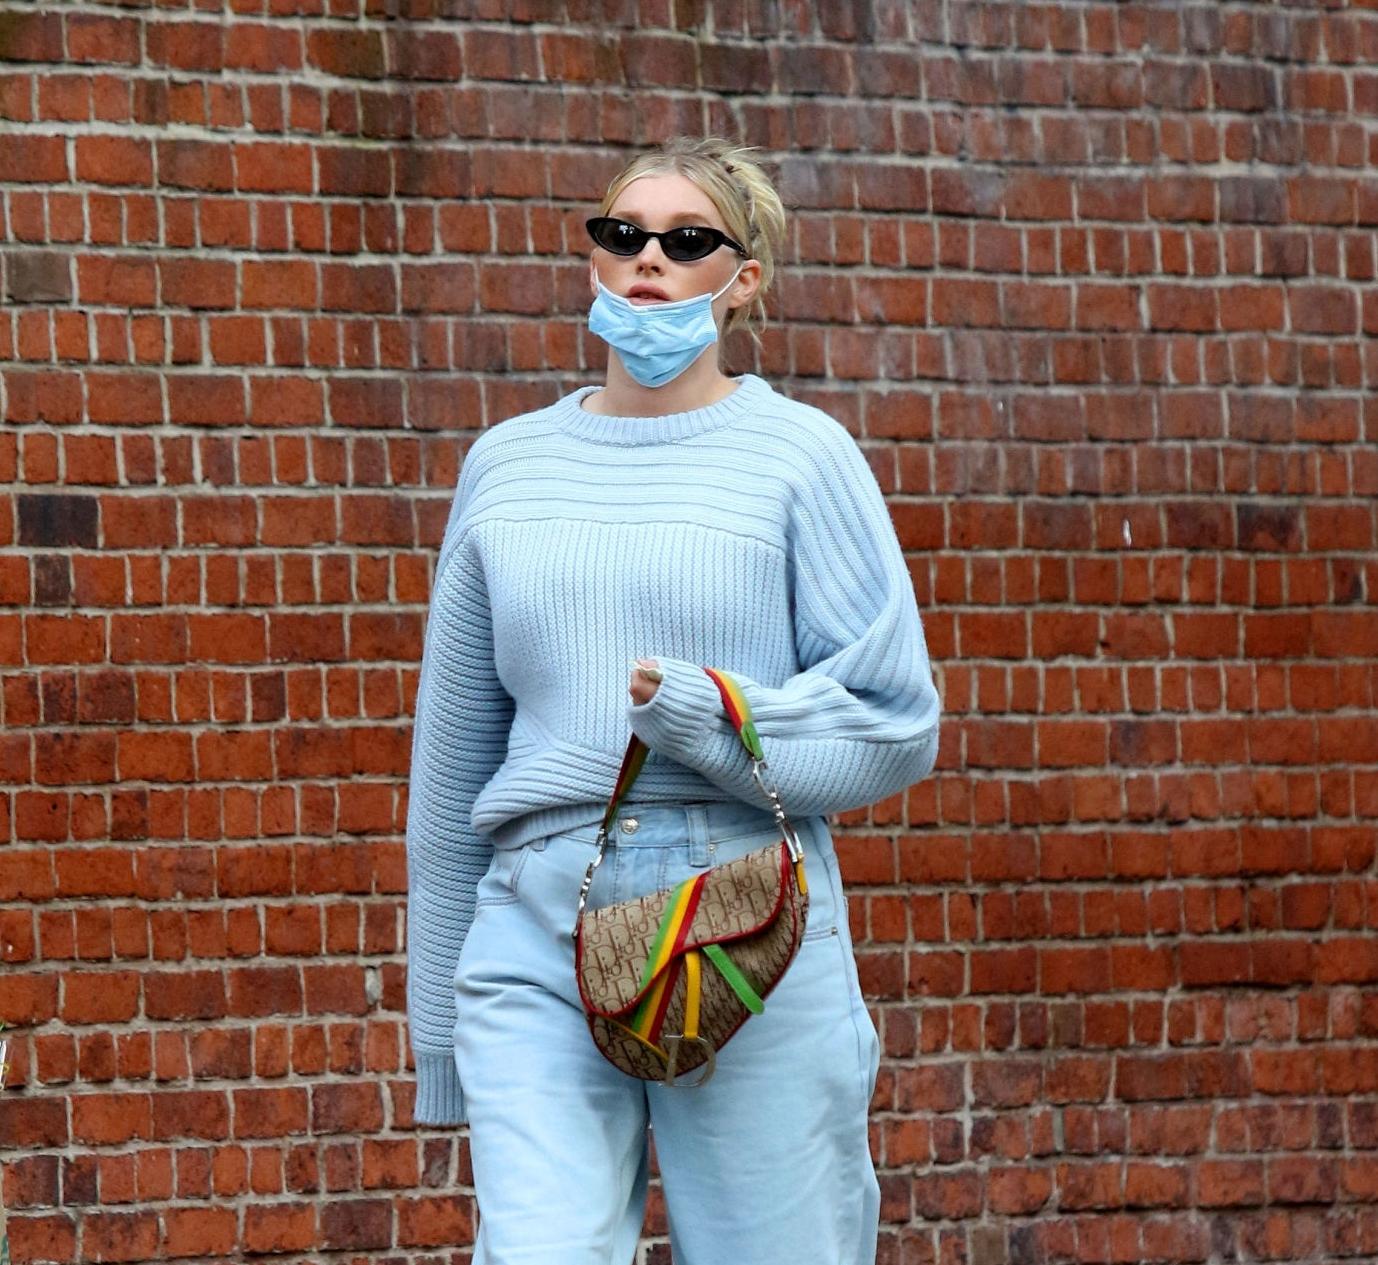 Elsa Hosk rocking straight fit light blue denim high rise jeans